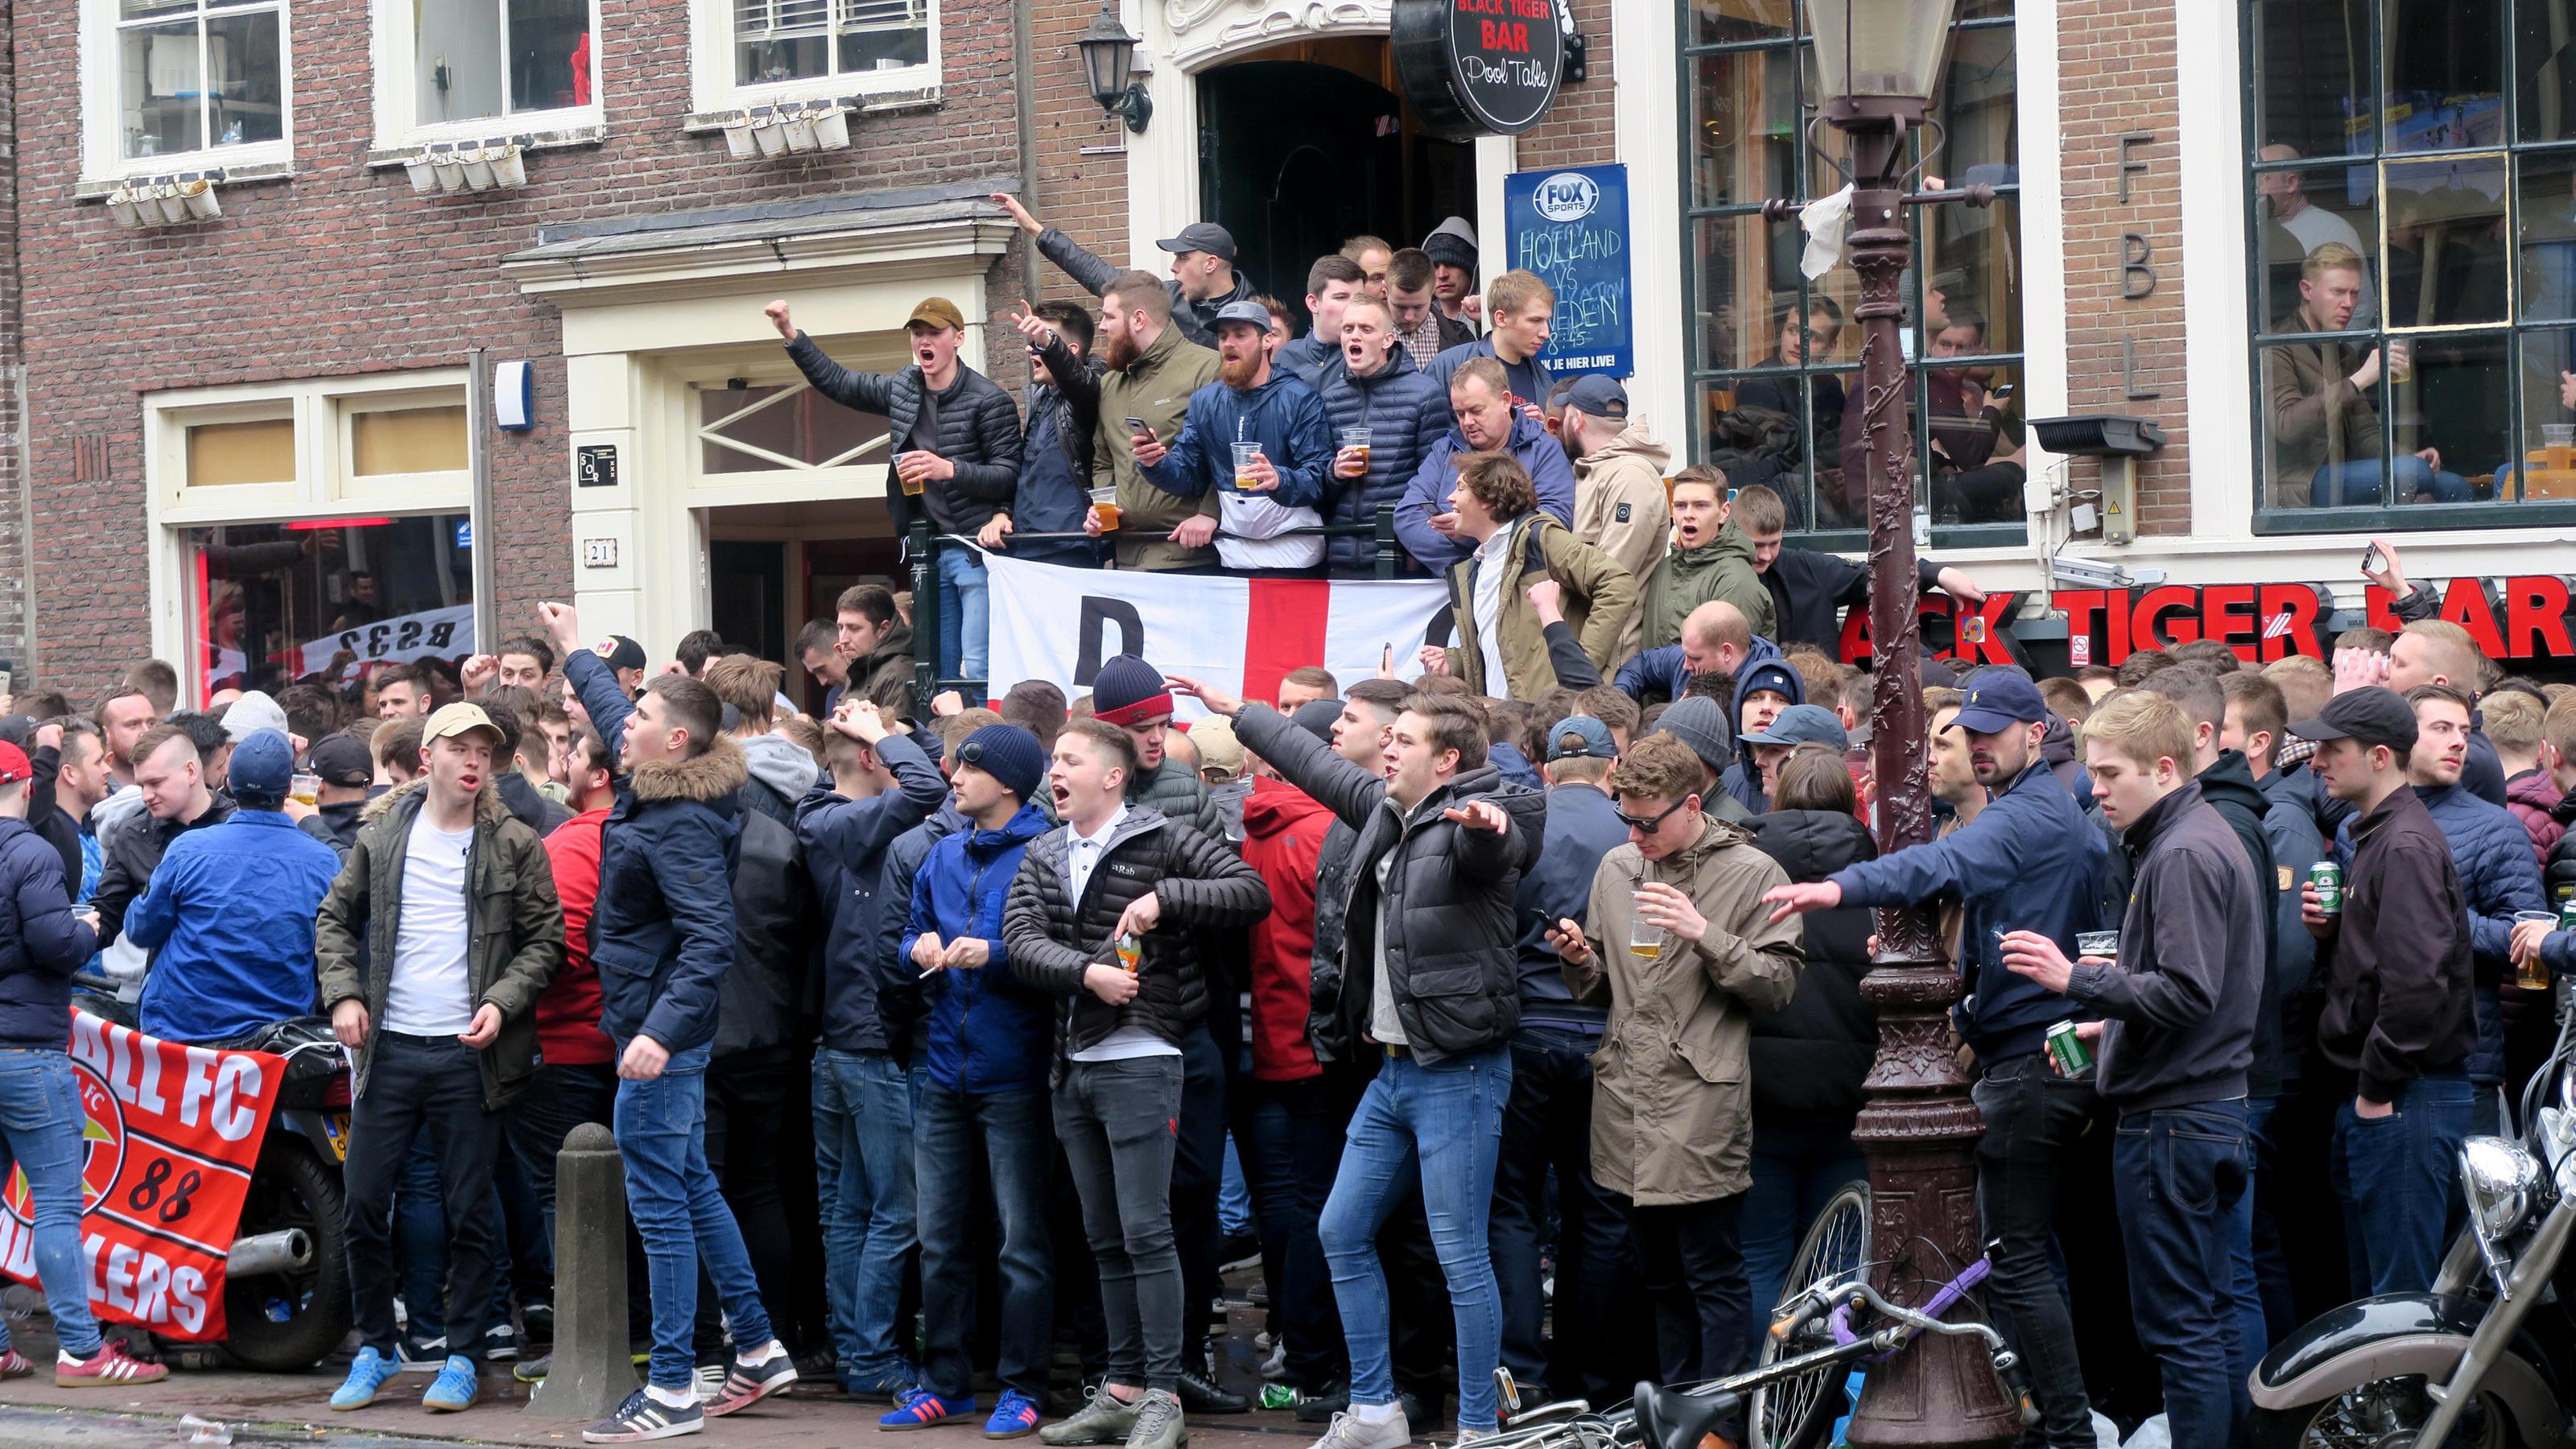 Englische Fußball-Fans randalieren